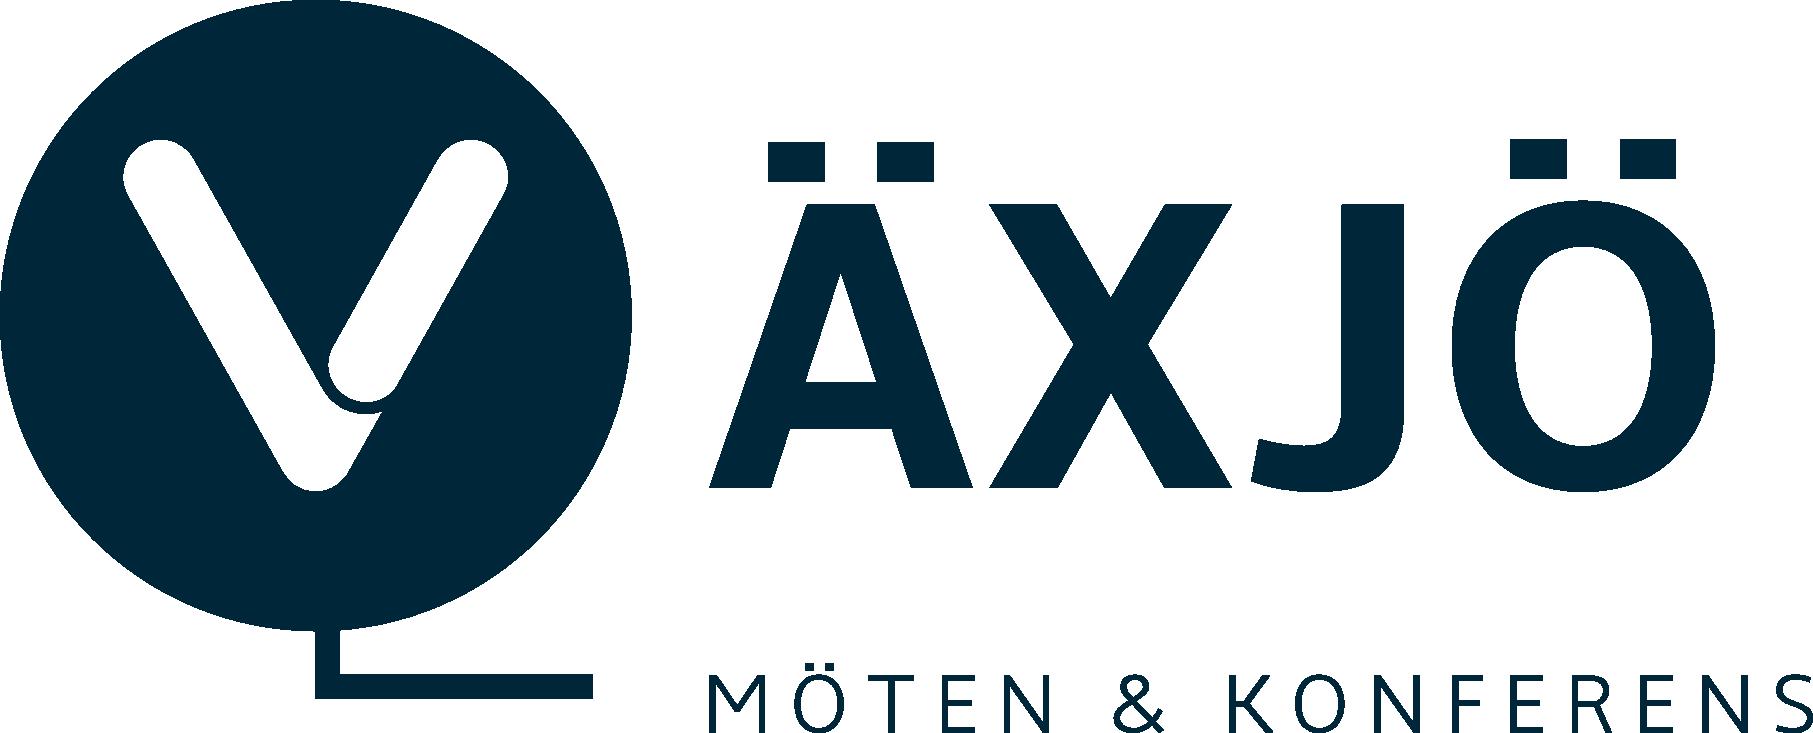 Konferens logotyp